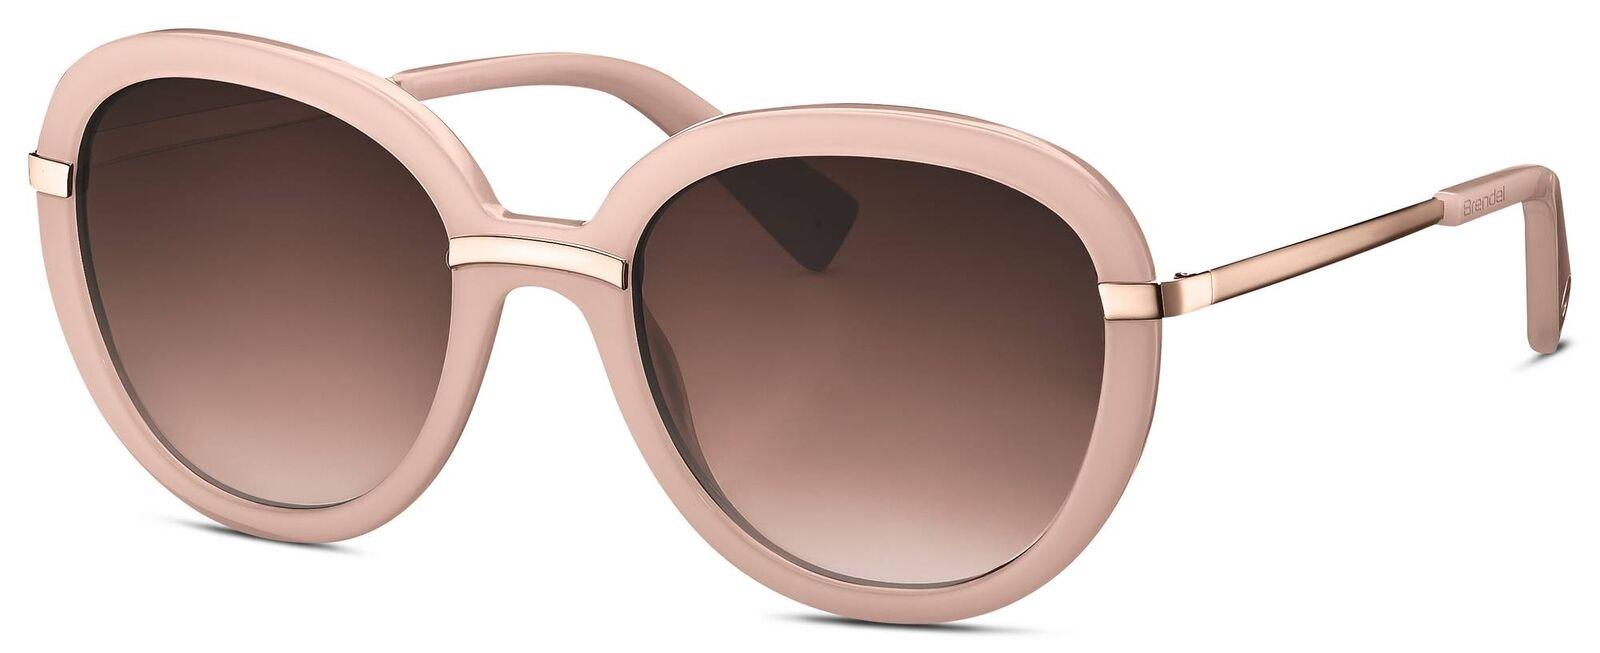 Brendel Eyewear 906124-Coffee EZeIrE